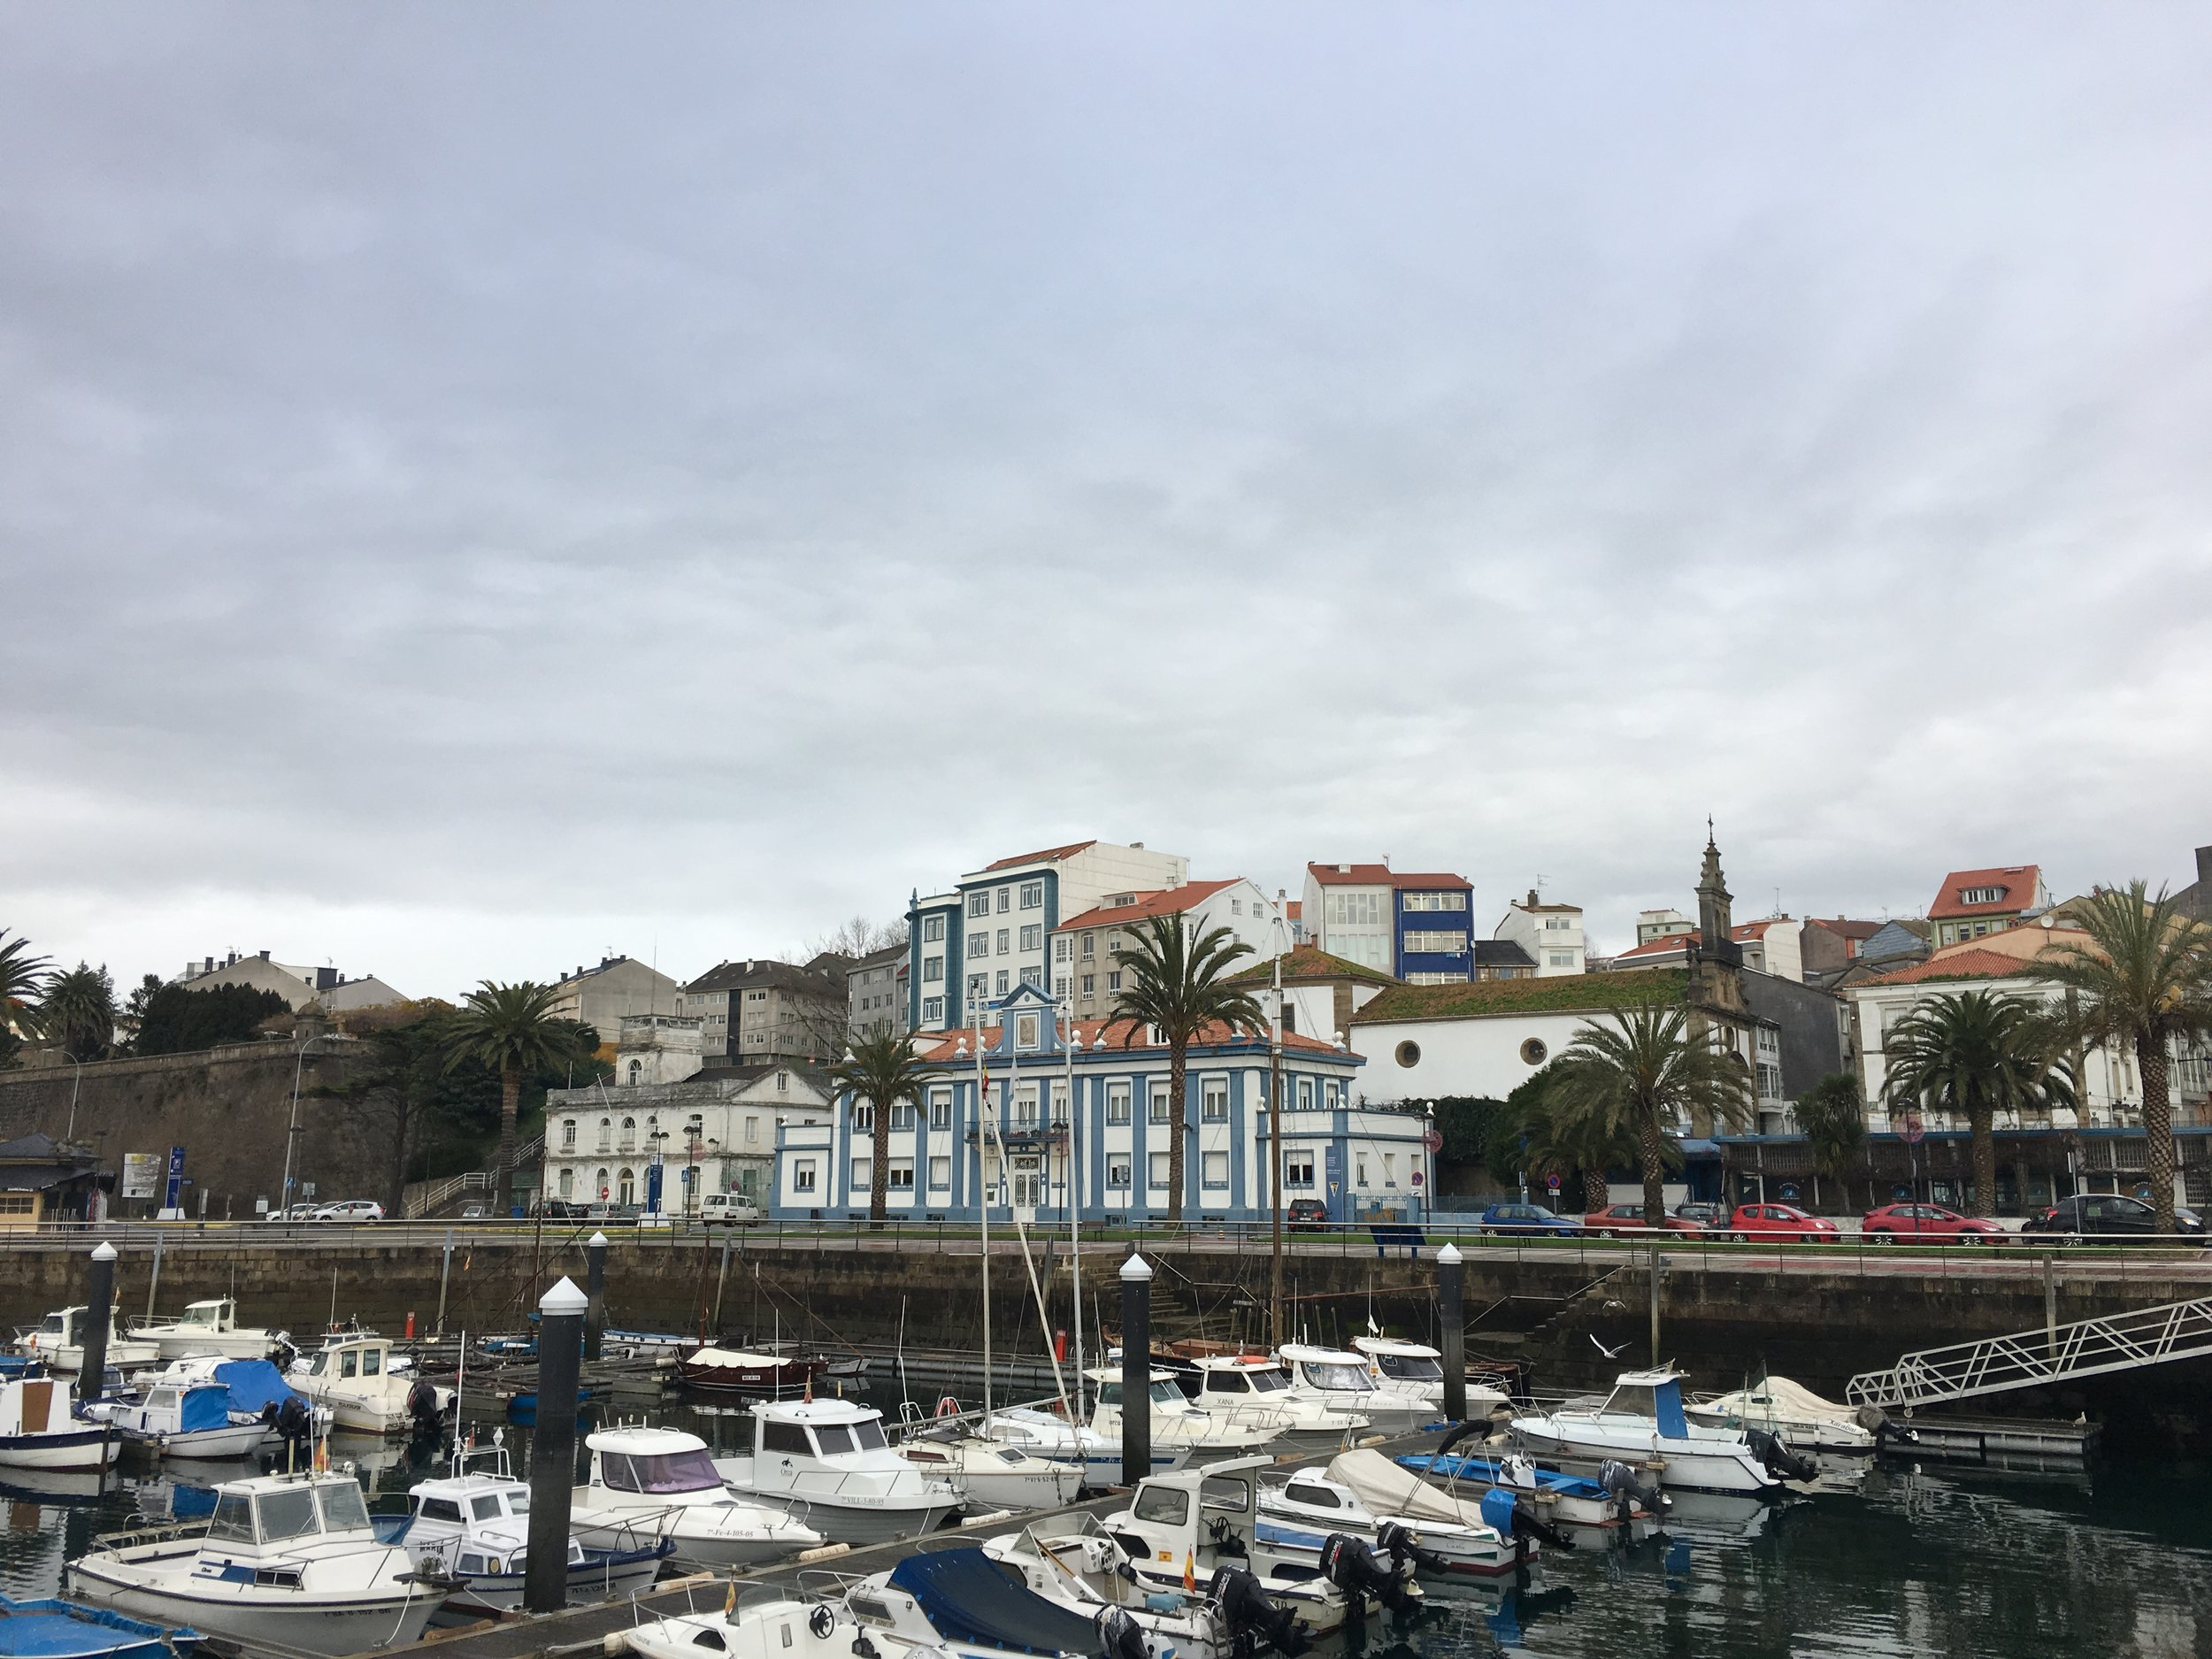 Ferrol, Spain - Taken during a weekly excursion